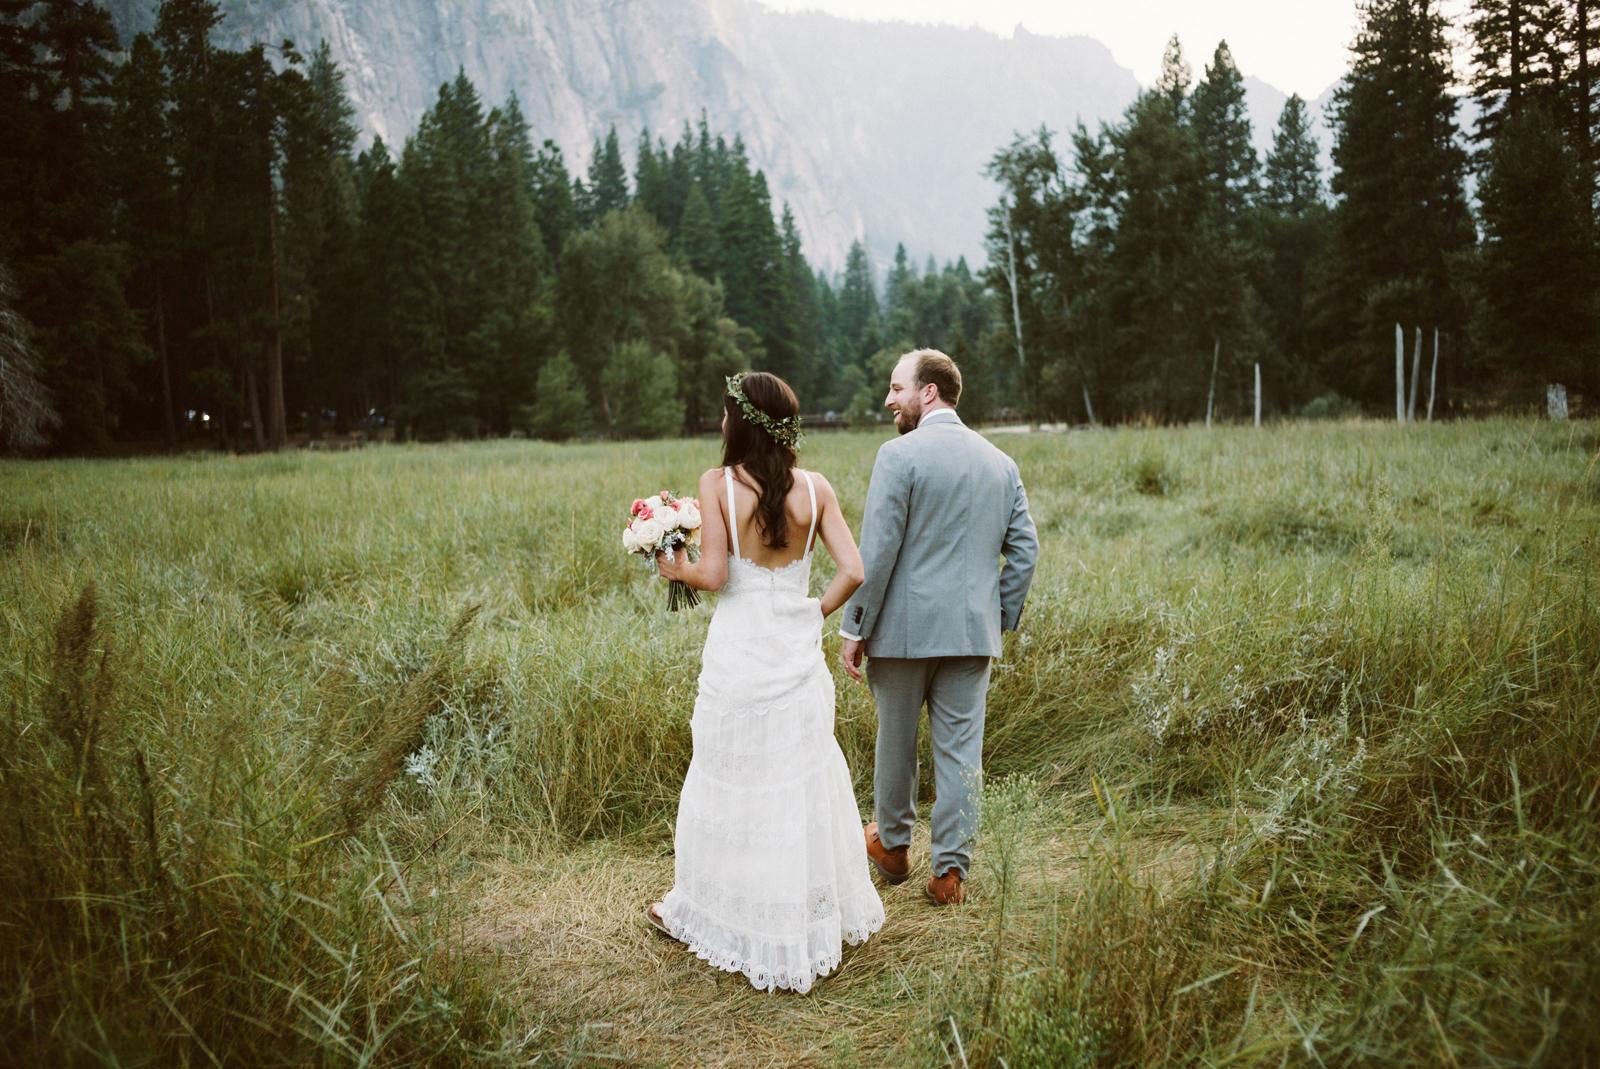 yosemite-intimate-wedding-096 YOSEMITE INTIMATE WEDDING